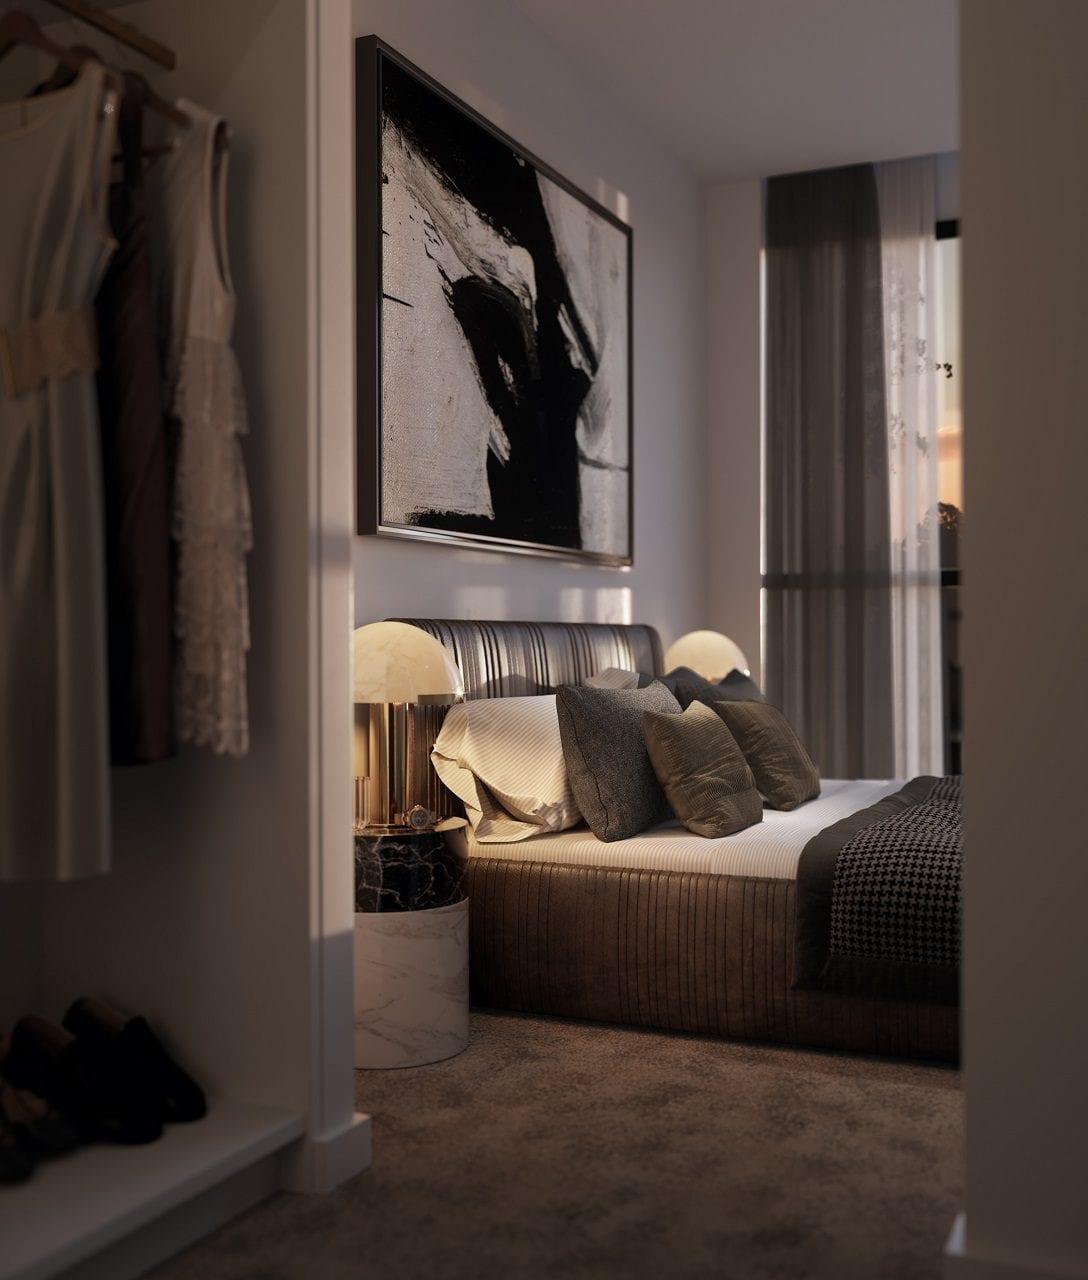 Raeon-Cornelia-Edition-AZU1299_Minnippi2_S070_INT_Bedroom_Vignette_R02